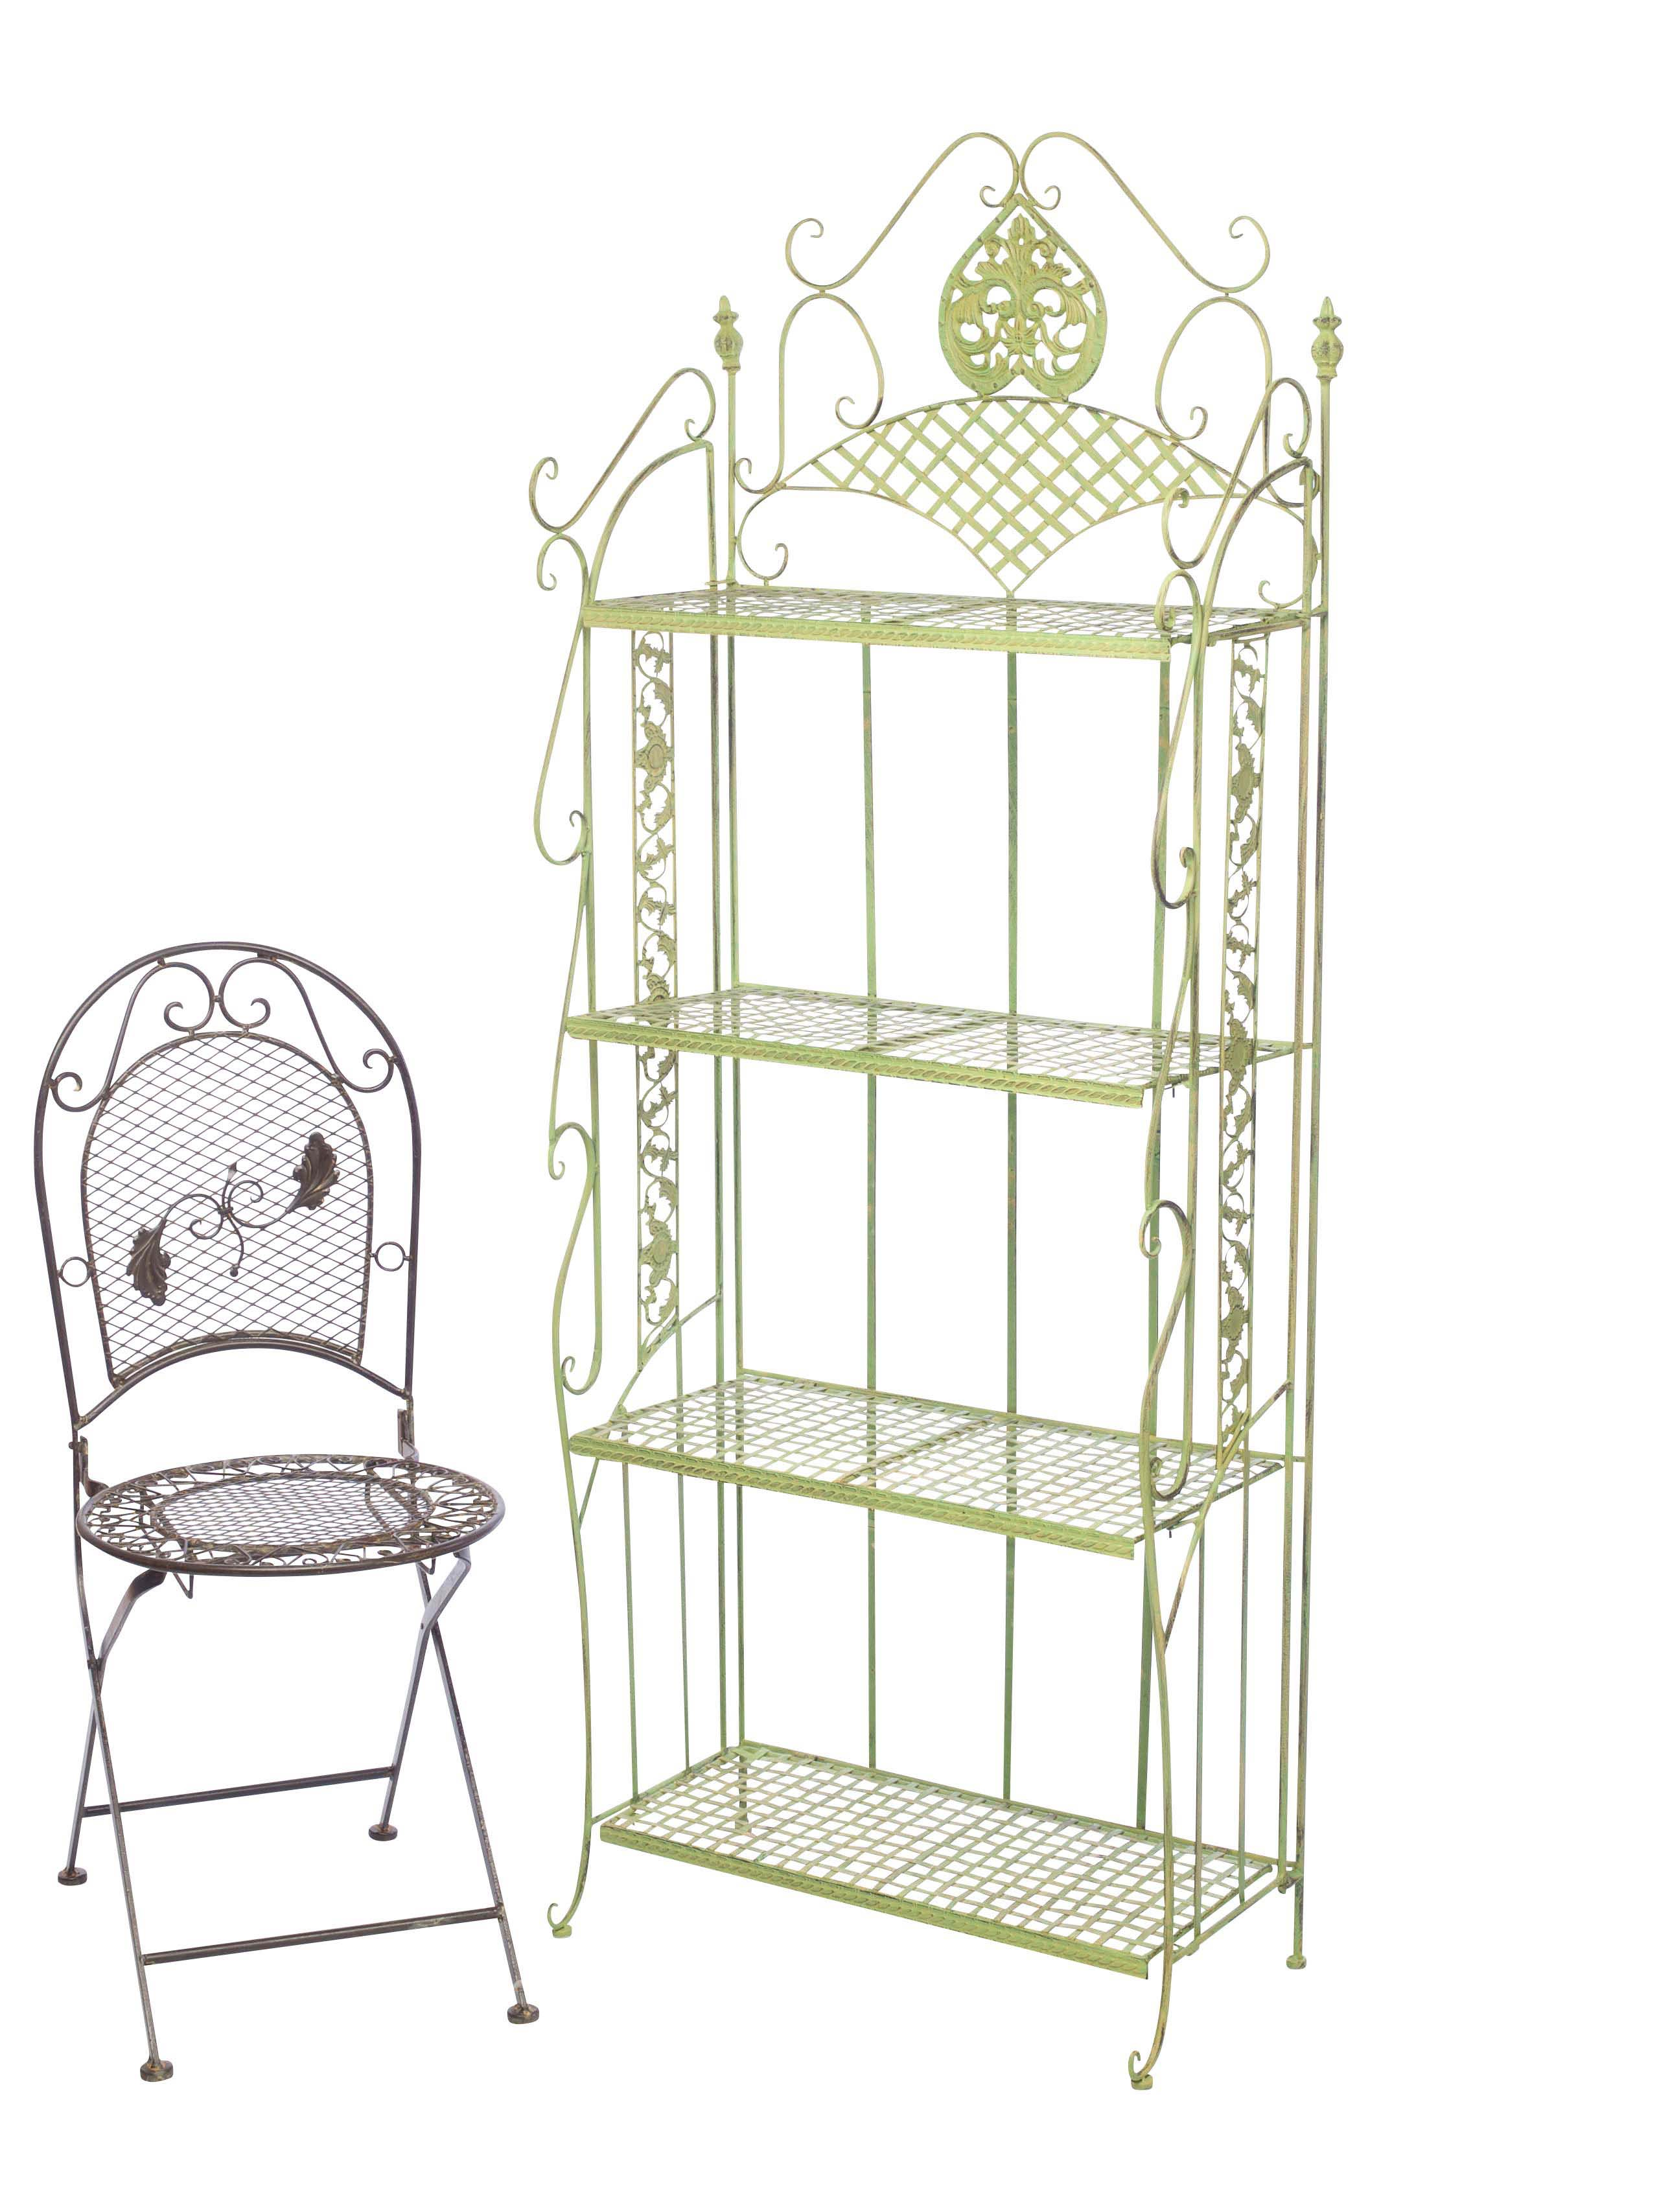 Delicieux Garden Shelf Iron Wrought Iron Furniture 175cm Antique Green 13kg